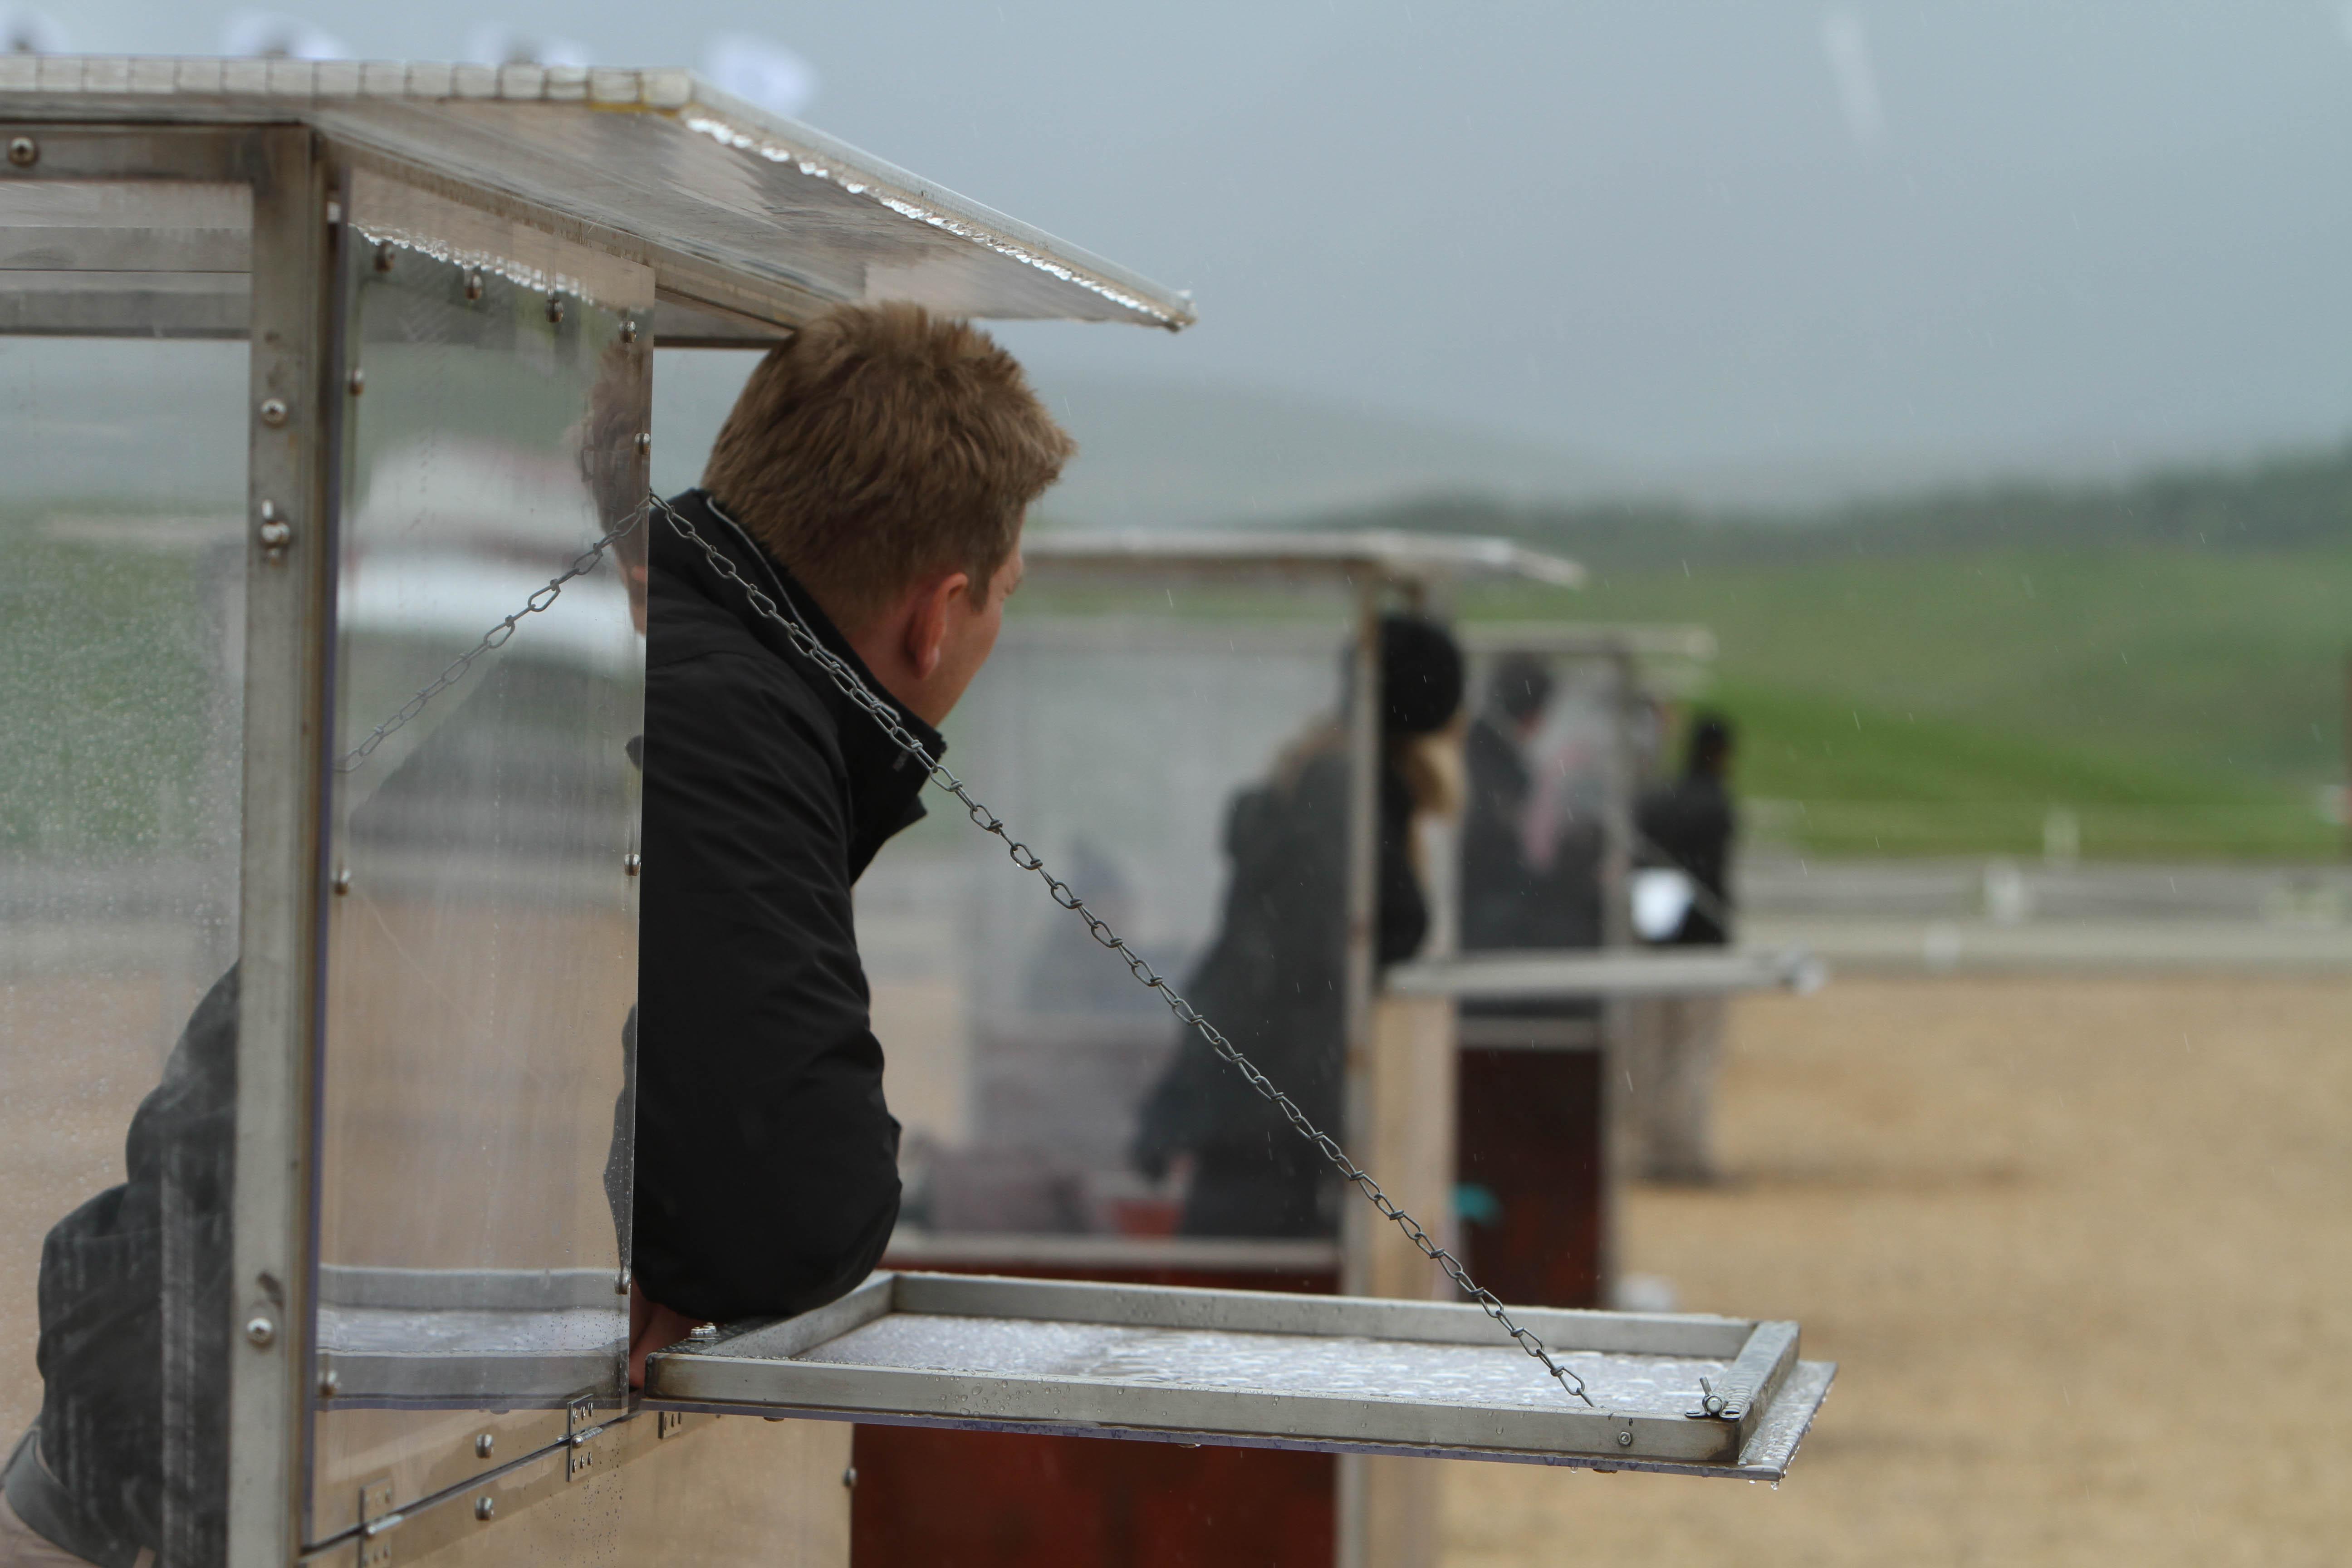 Domarna kikar fram ur sina domarbås Foto: Karin Cederman/ishestnews.se